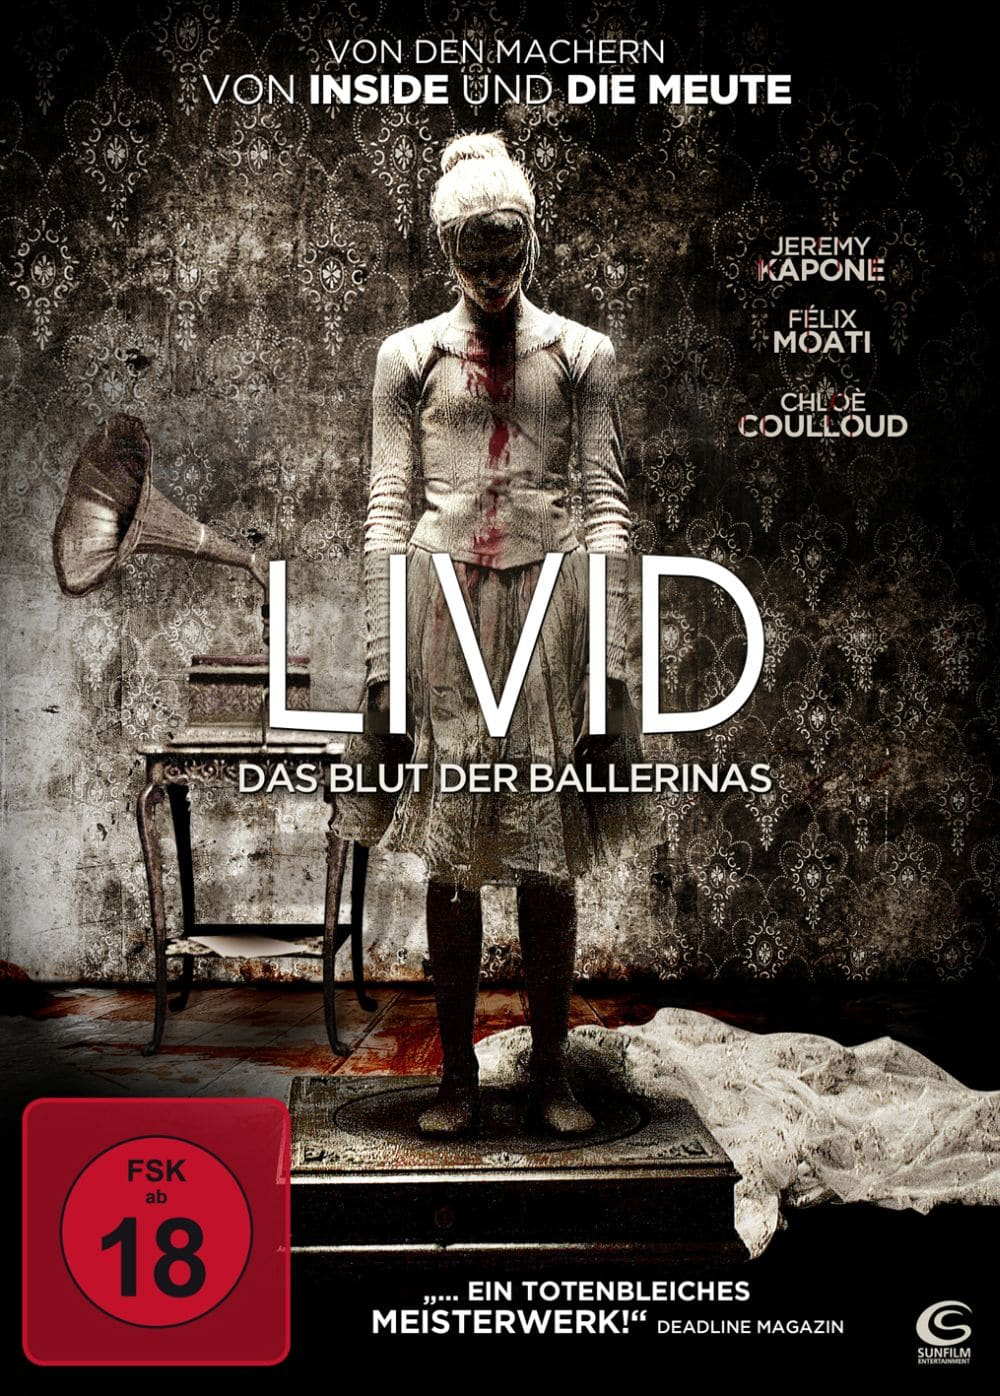 Besten Horrorfilme 2011